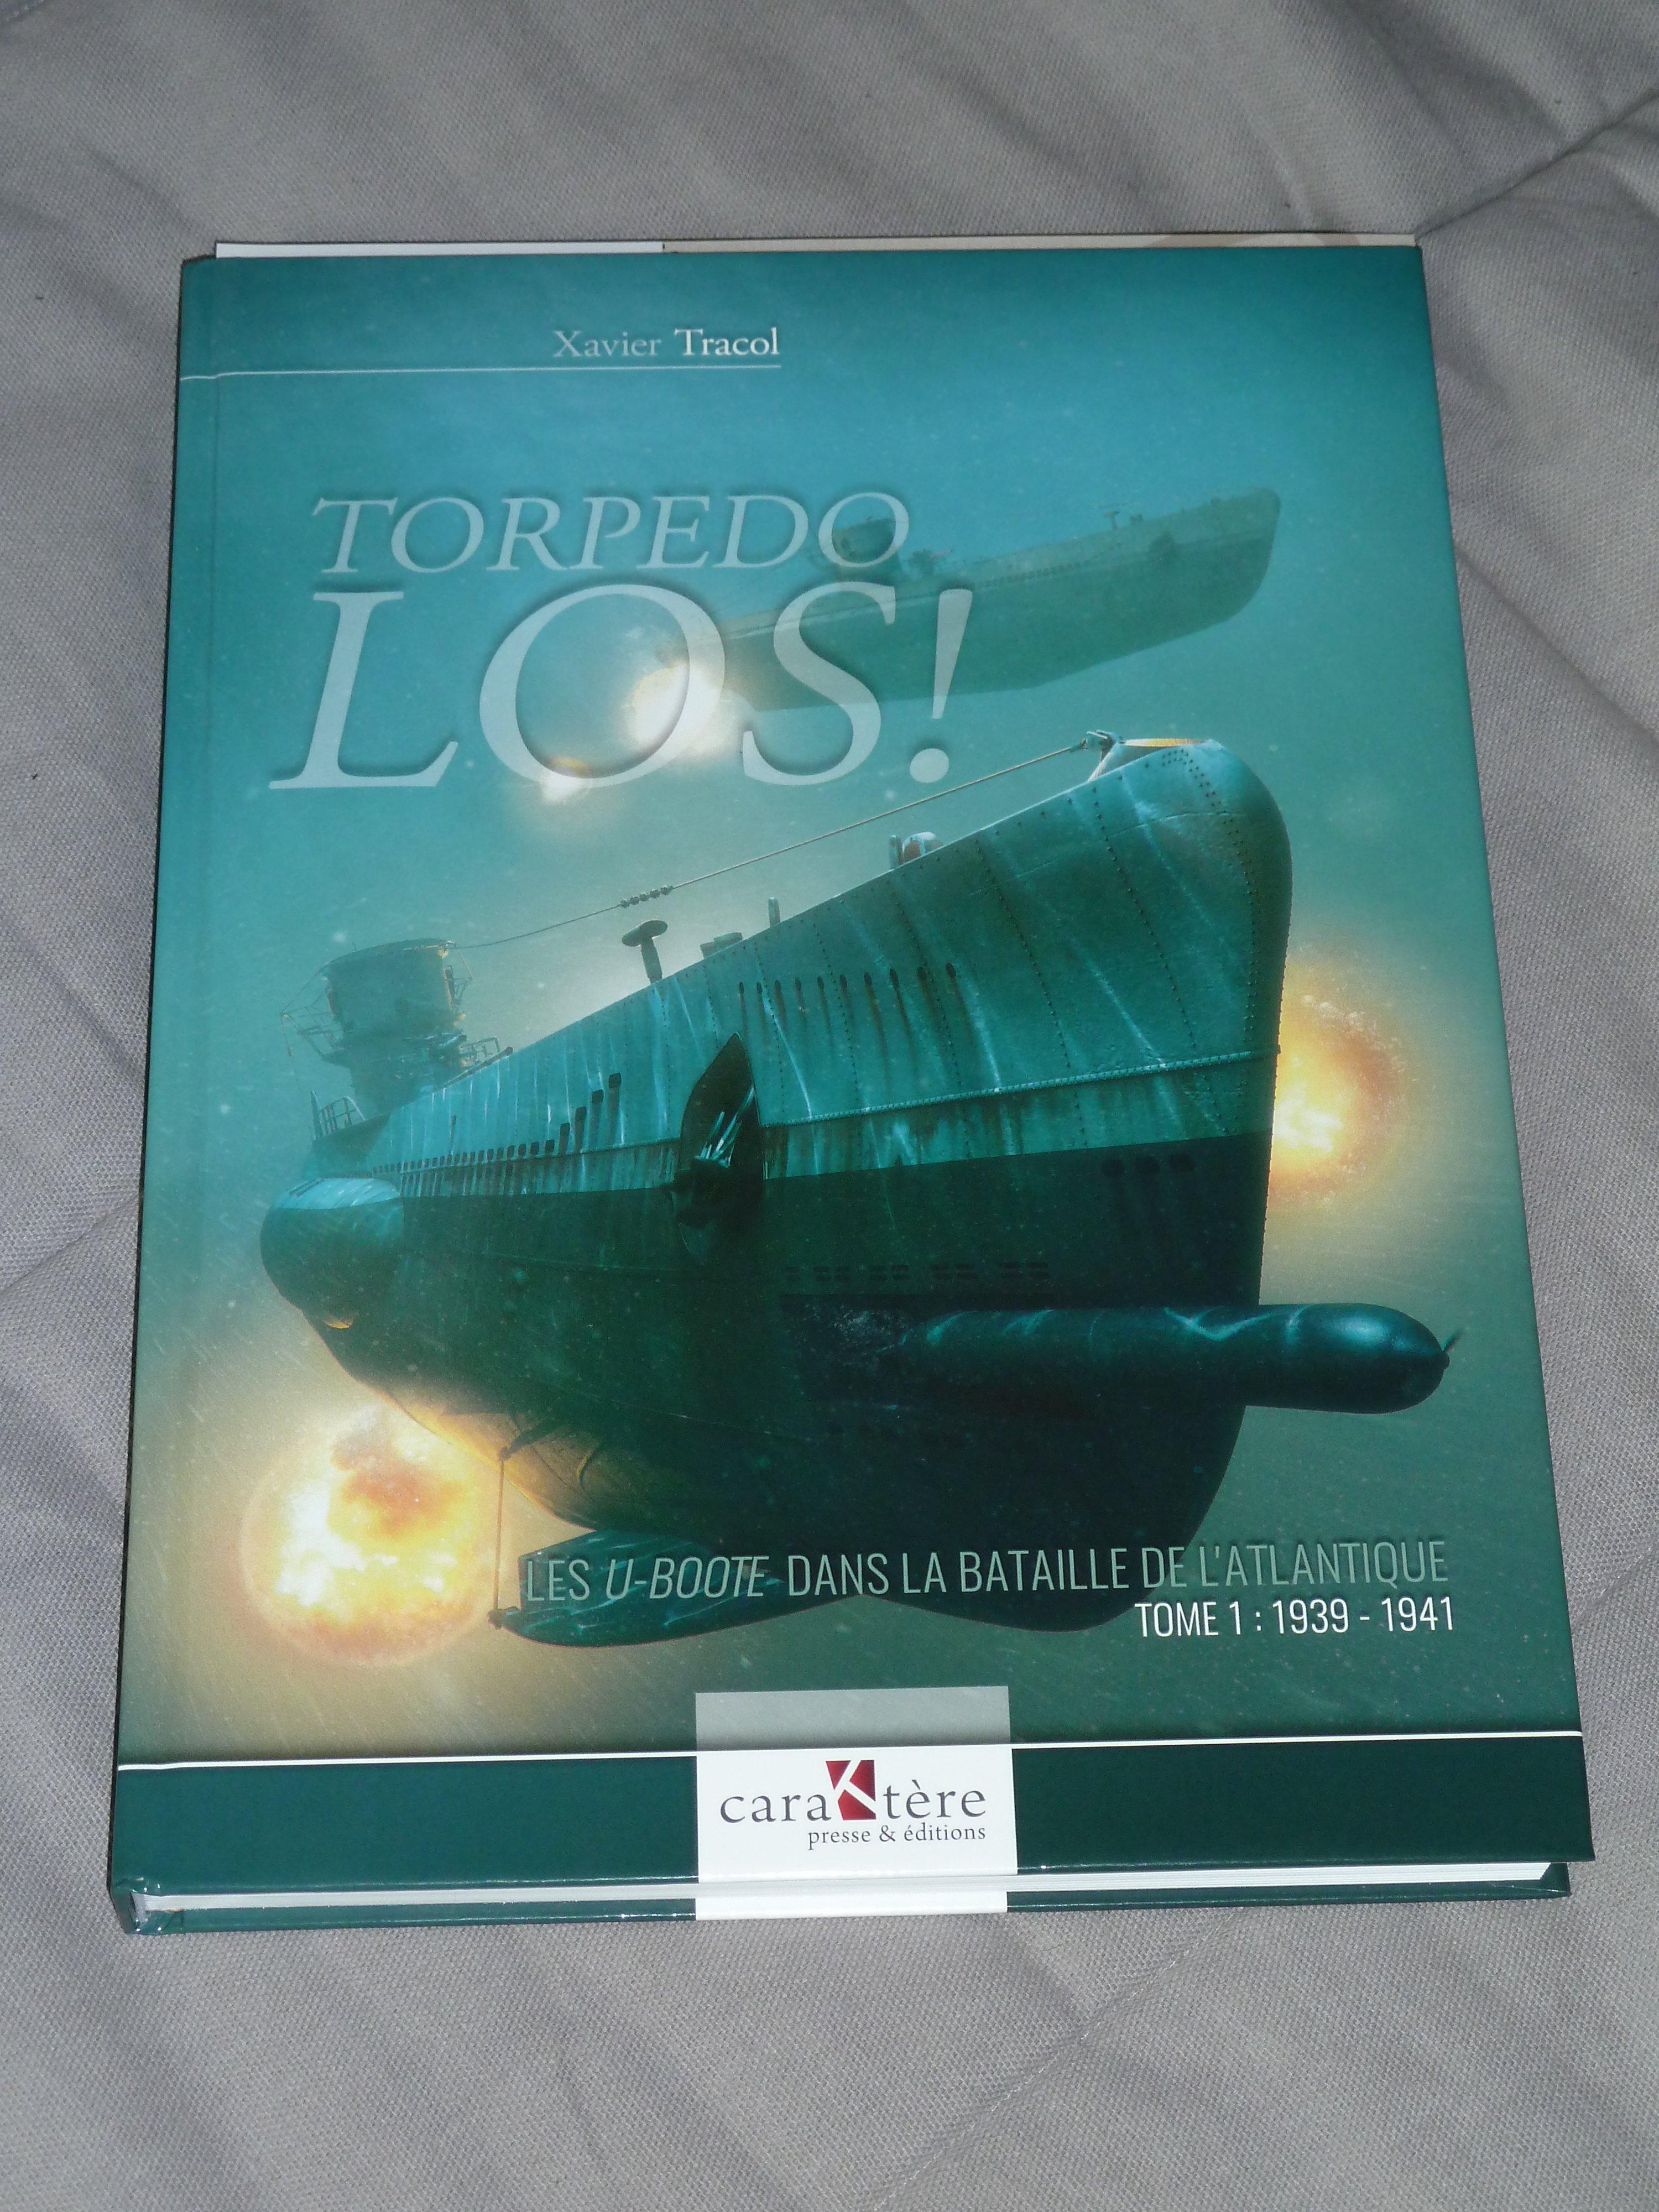 """Torpedo LOS !"", Tome 1 - 1939-1941, by Xavier Tracol"